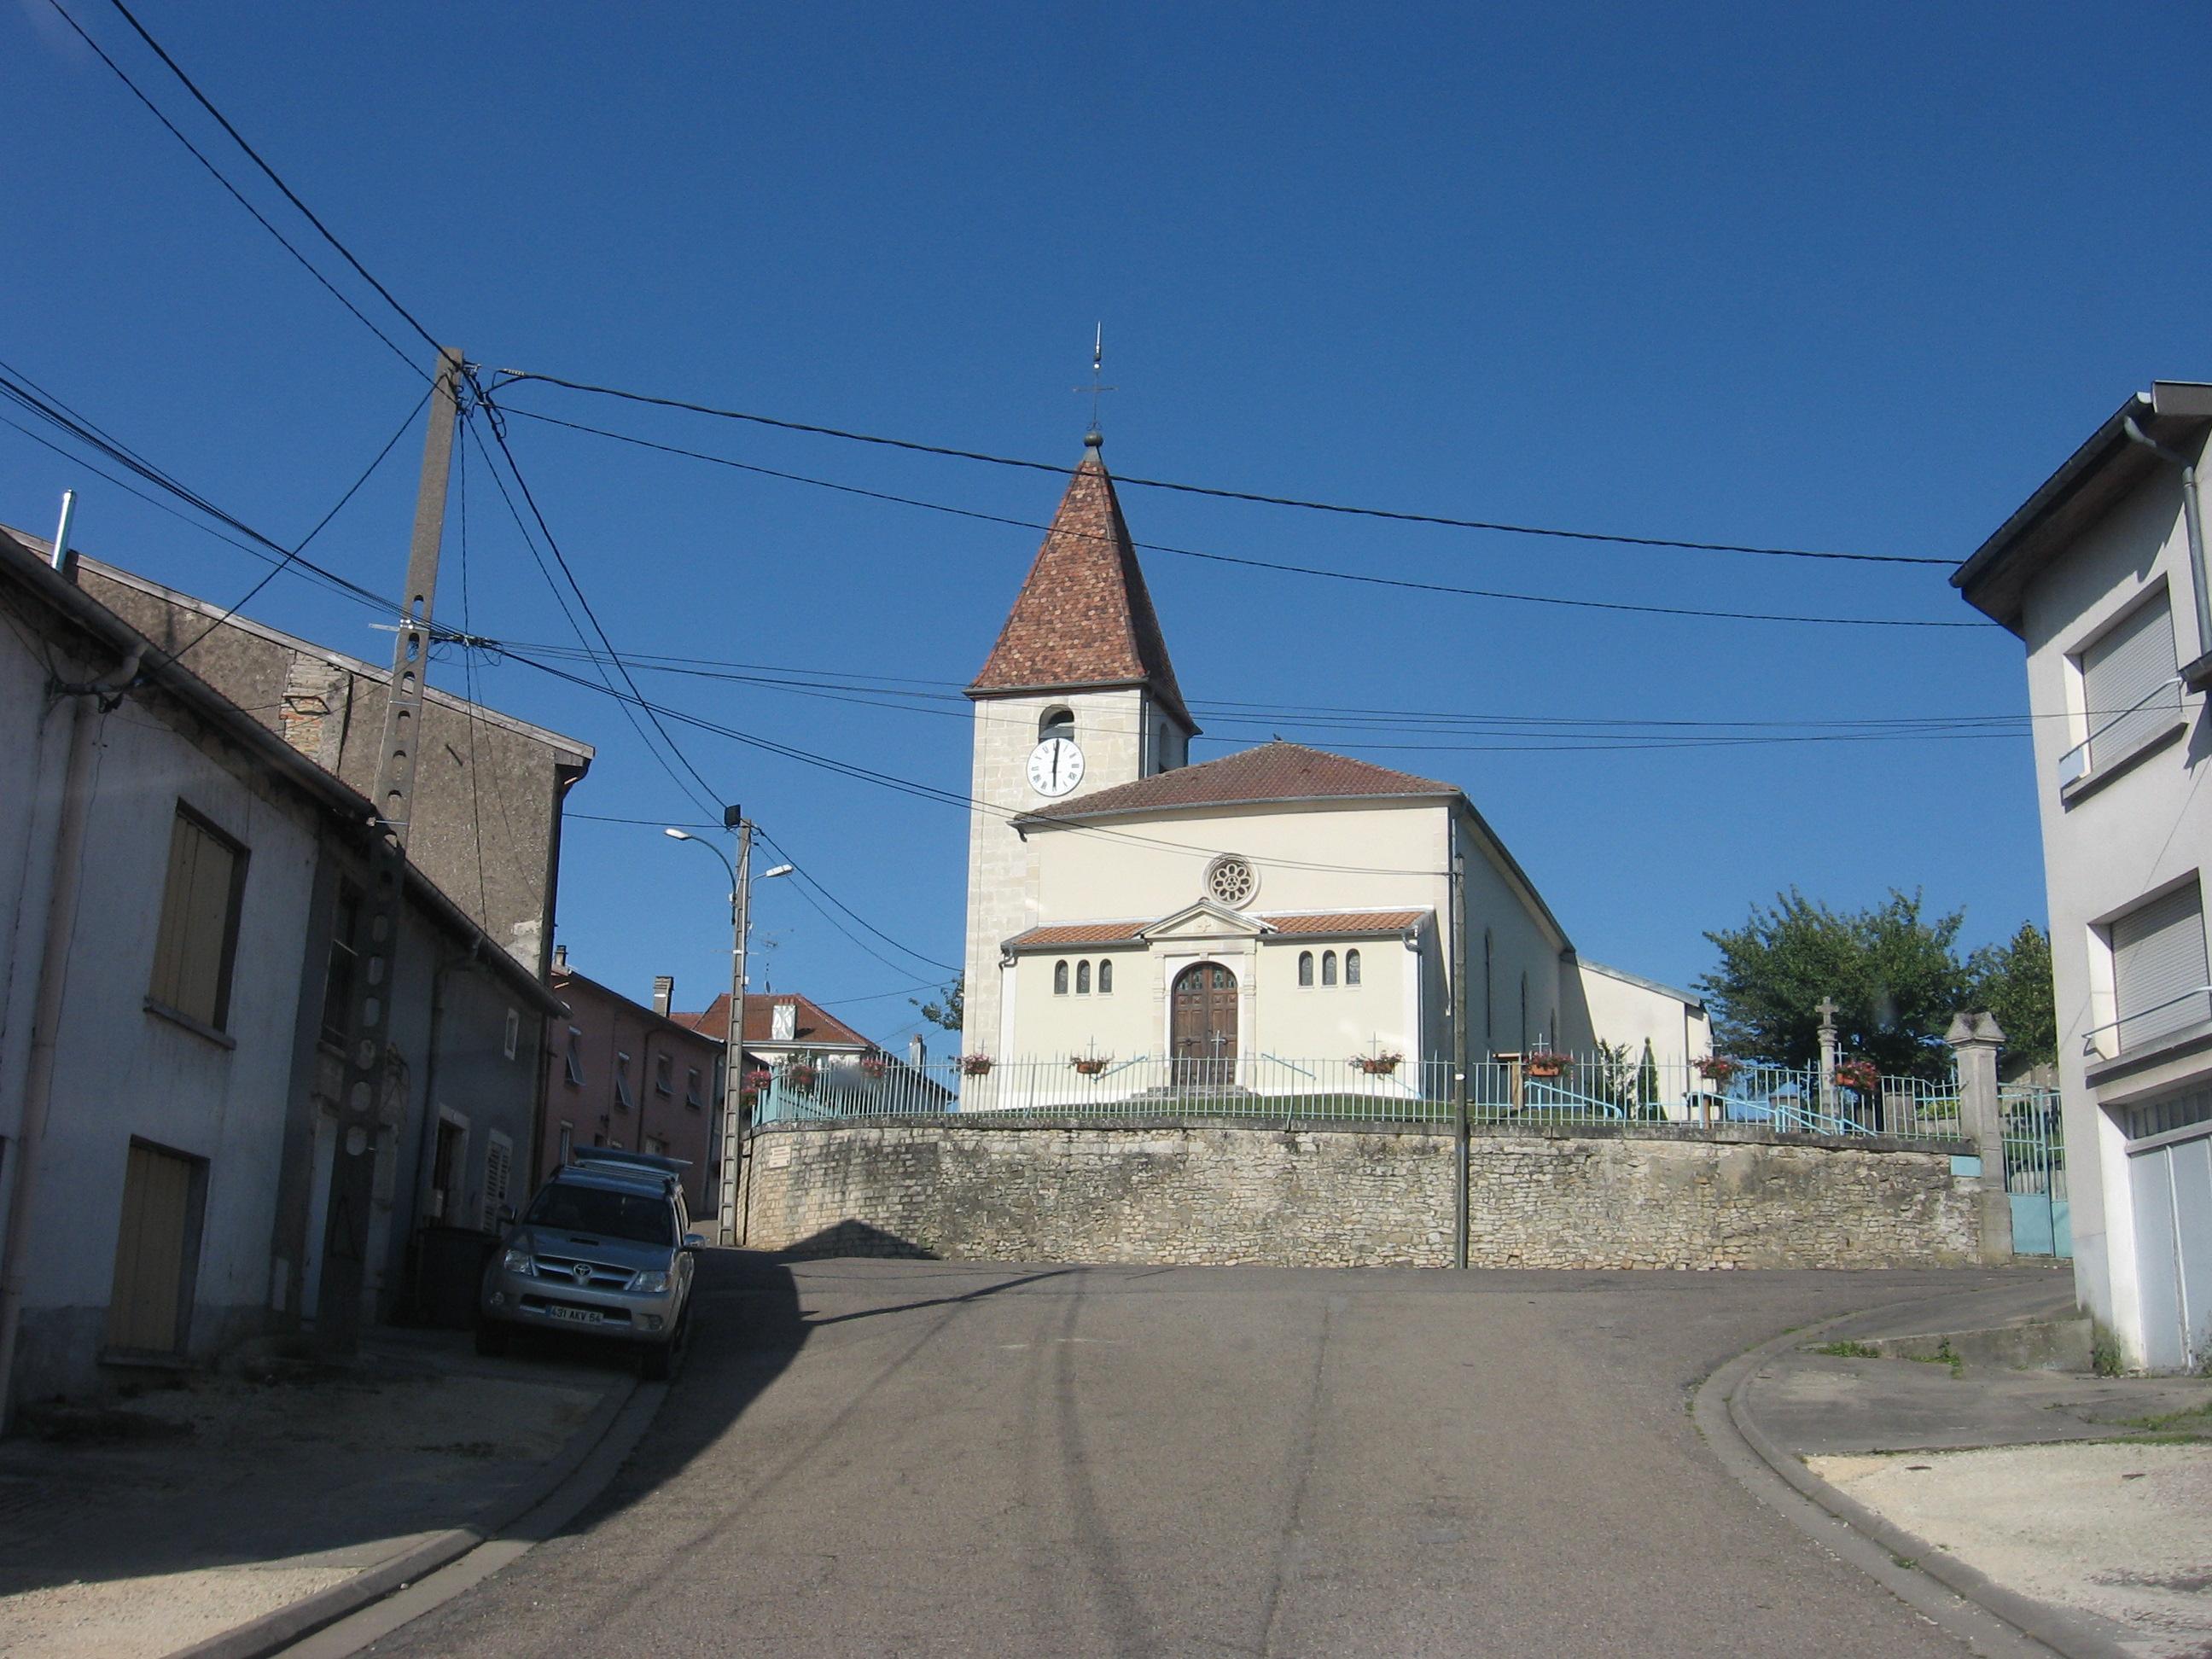 Chaudeney-sur-Moselle